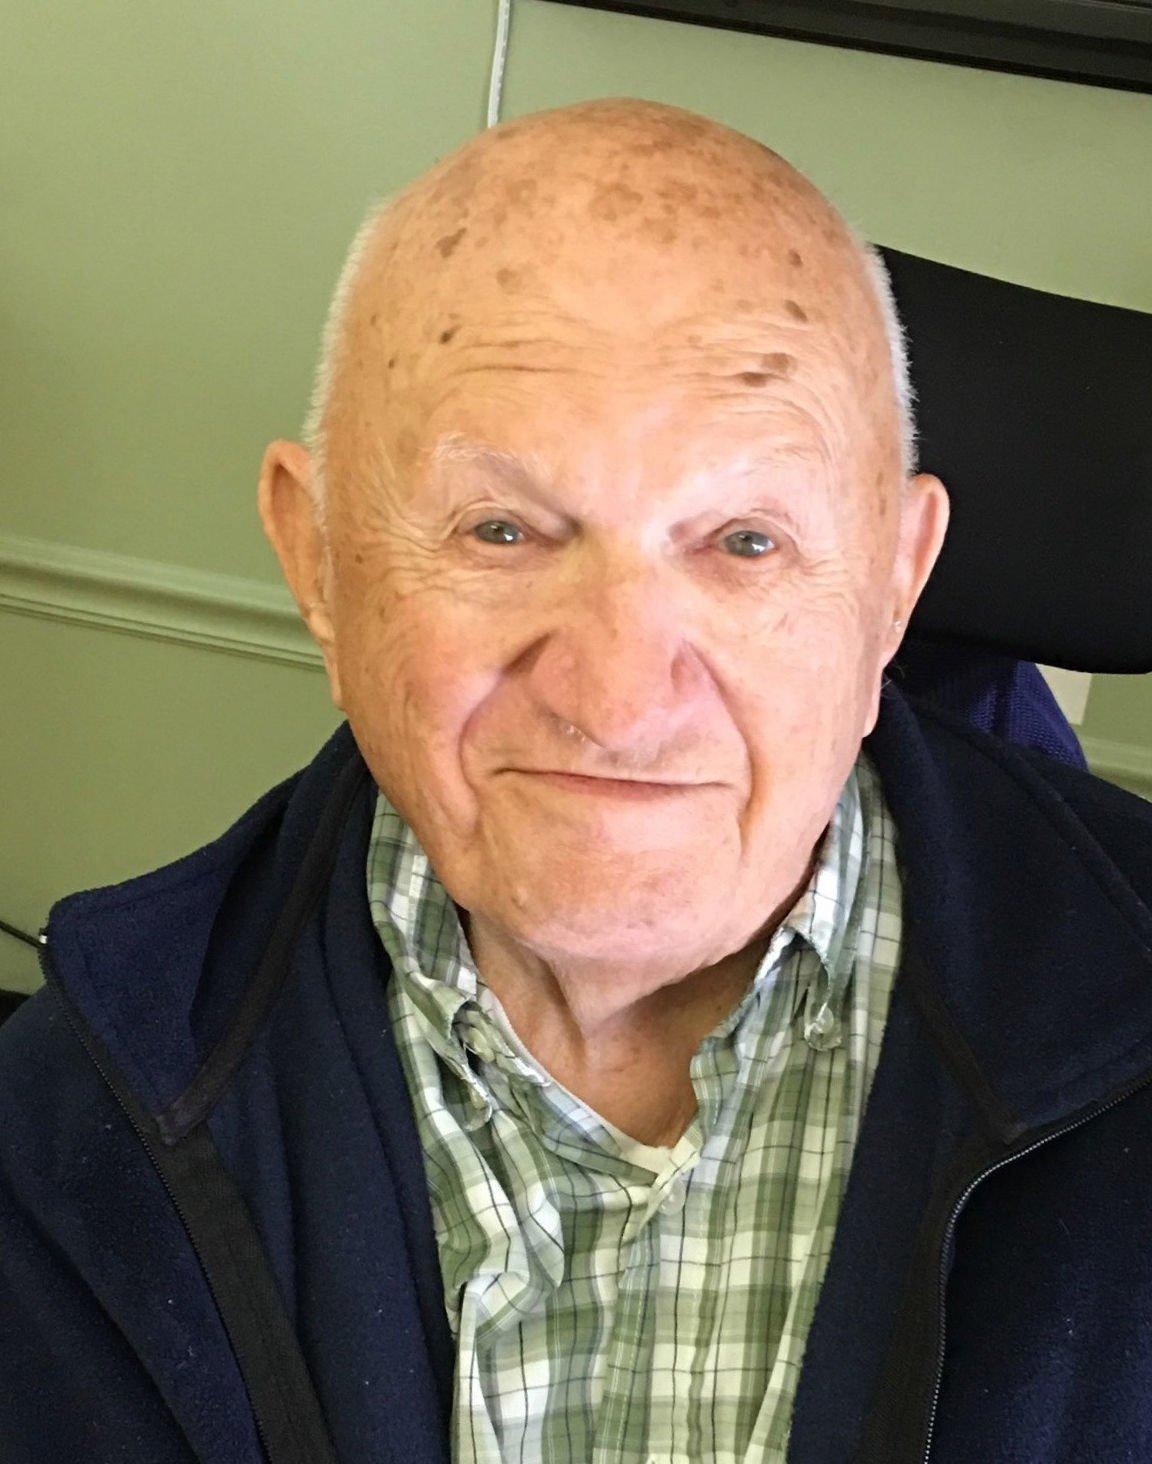 Andrew J. Steyer